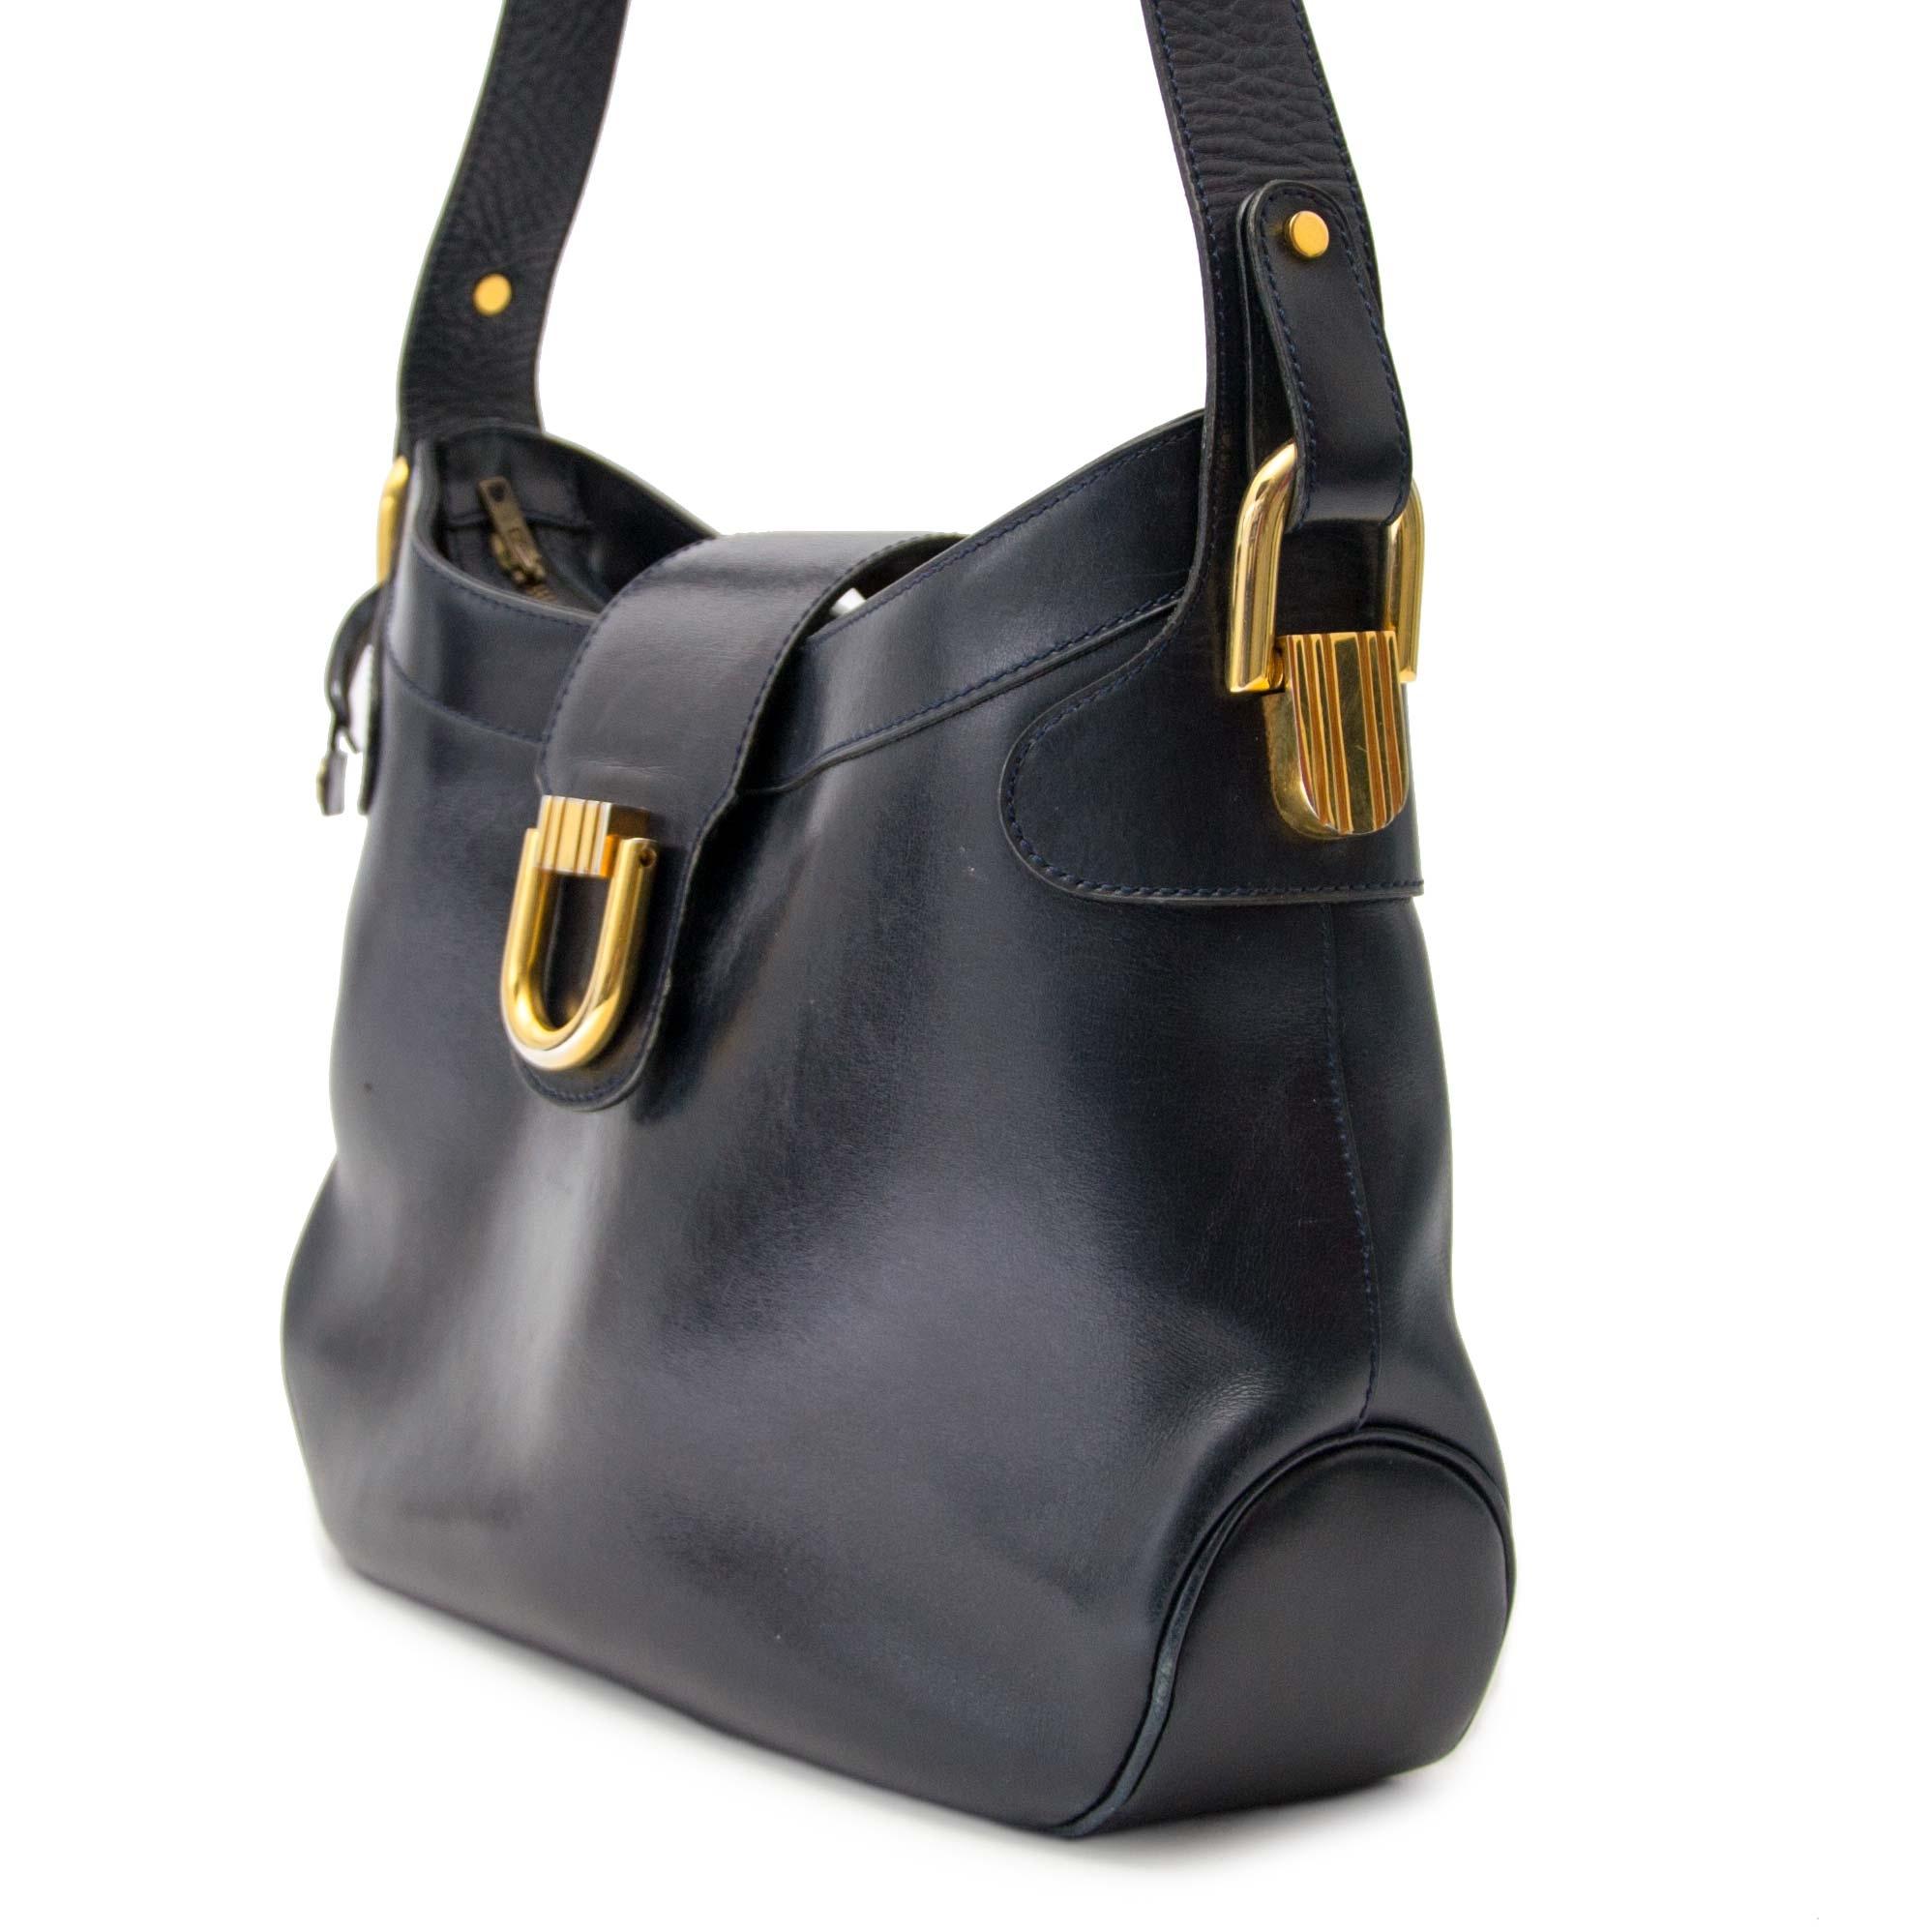 3556ec6adba ... Delvaux Vintage Blue Leather Shoulder Bag Buy authentic designer  Delvaux secondhand bags at Labellov at the